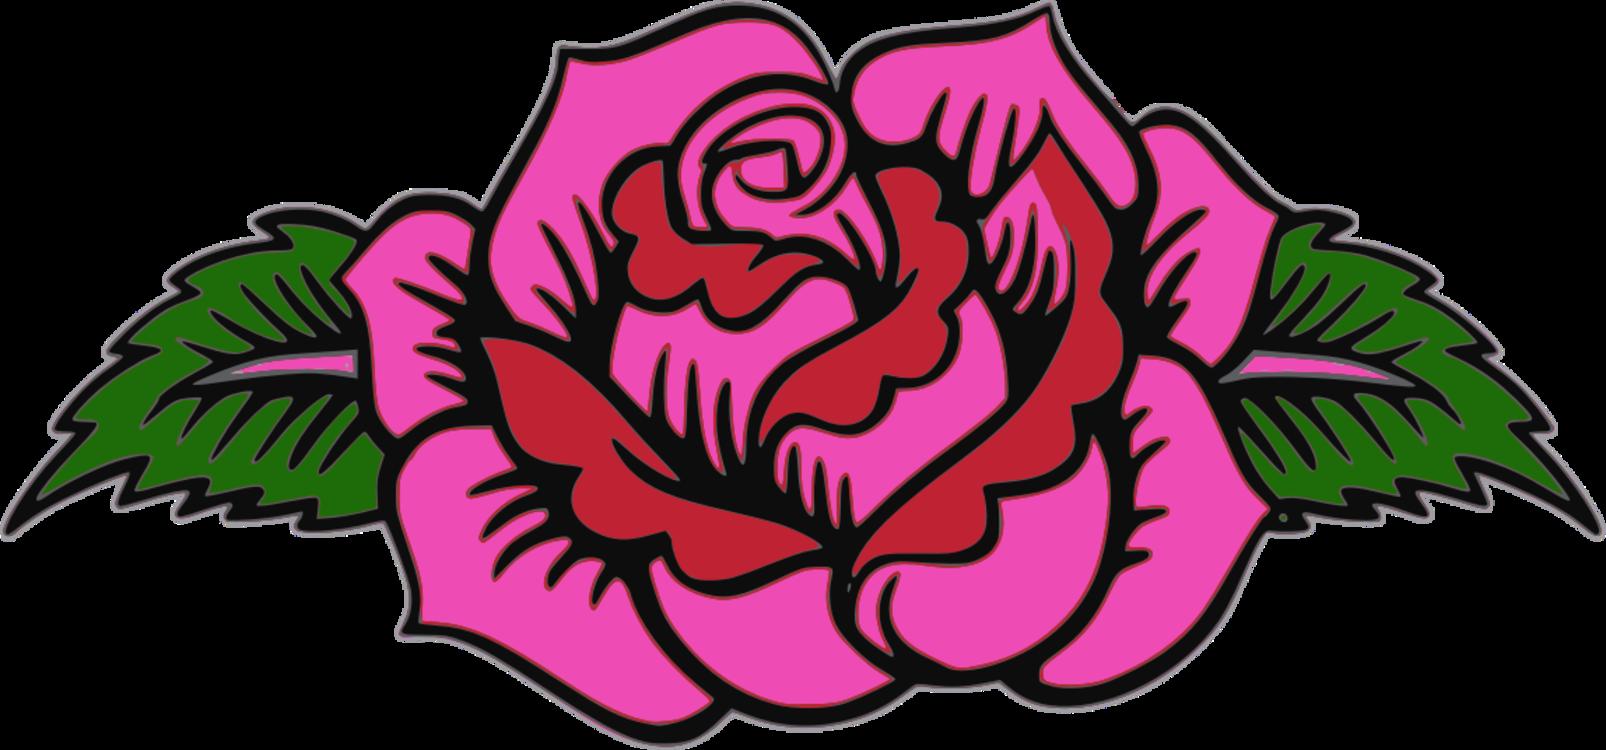 Art order petal png. Clipart roses dead rose